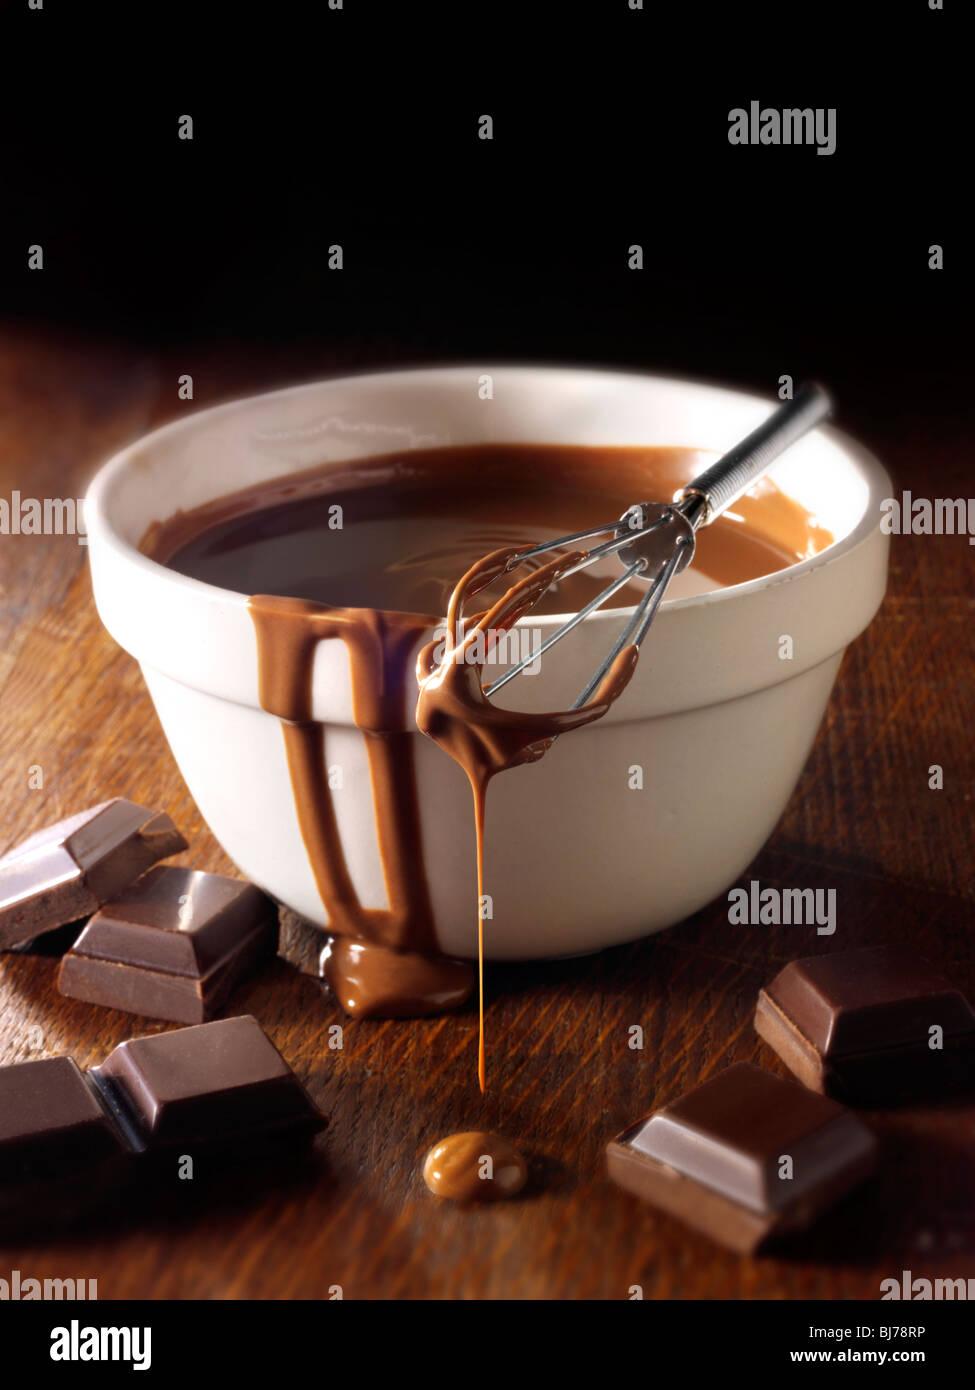 Geschmolzene Choclate wird in einer Schüssel - Stock Photos gerührt. Stockbild